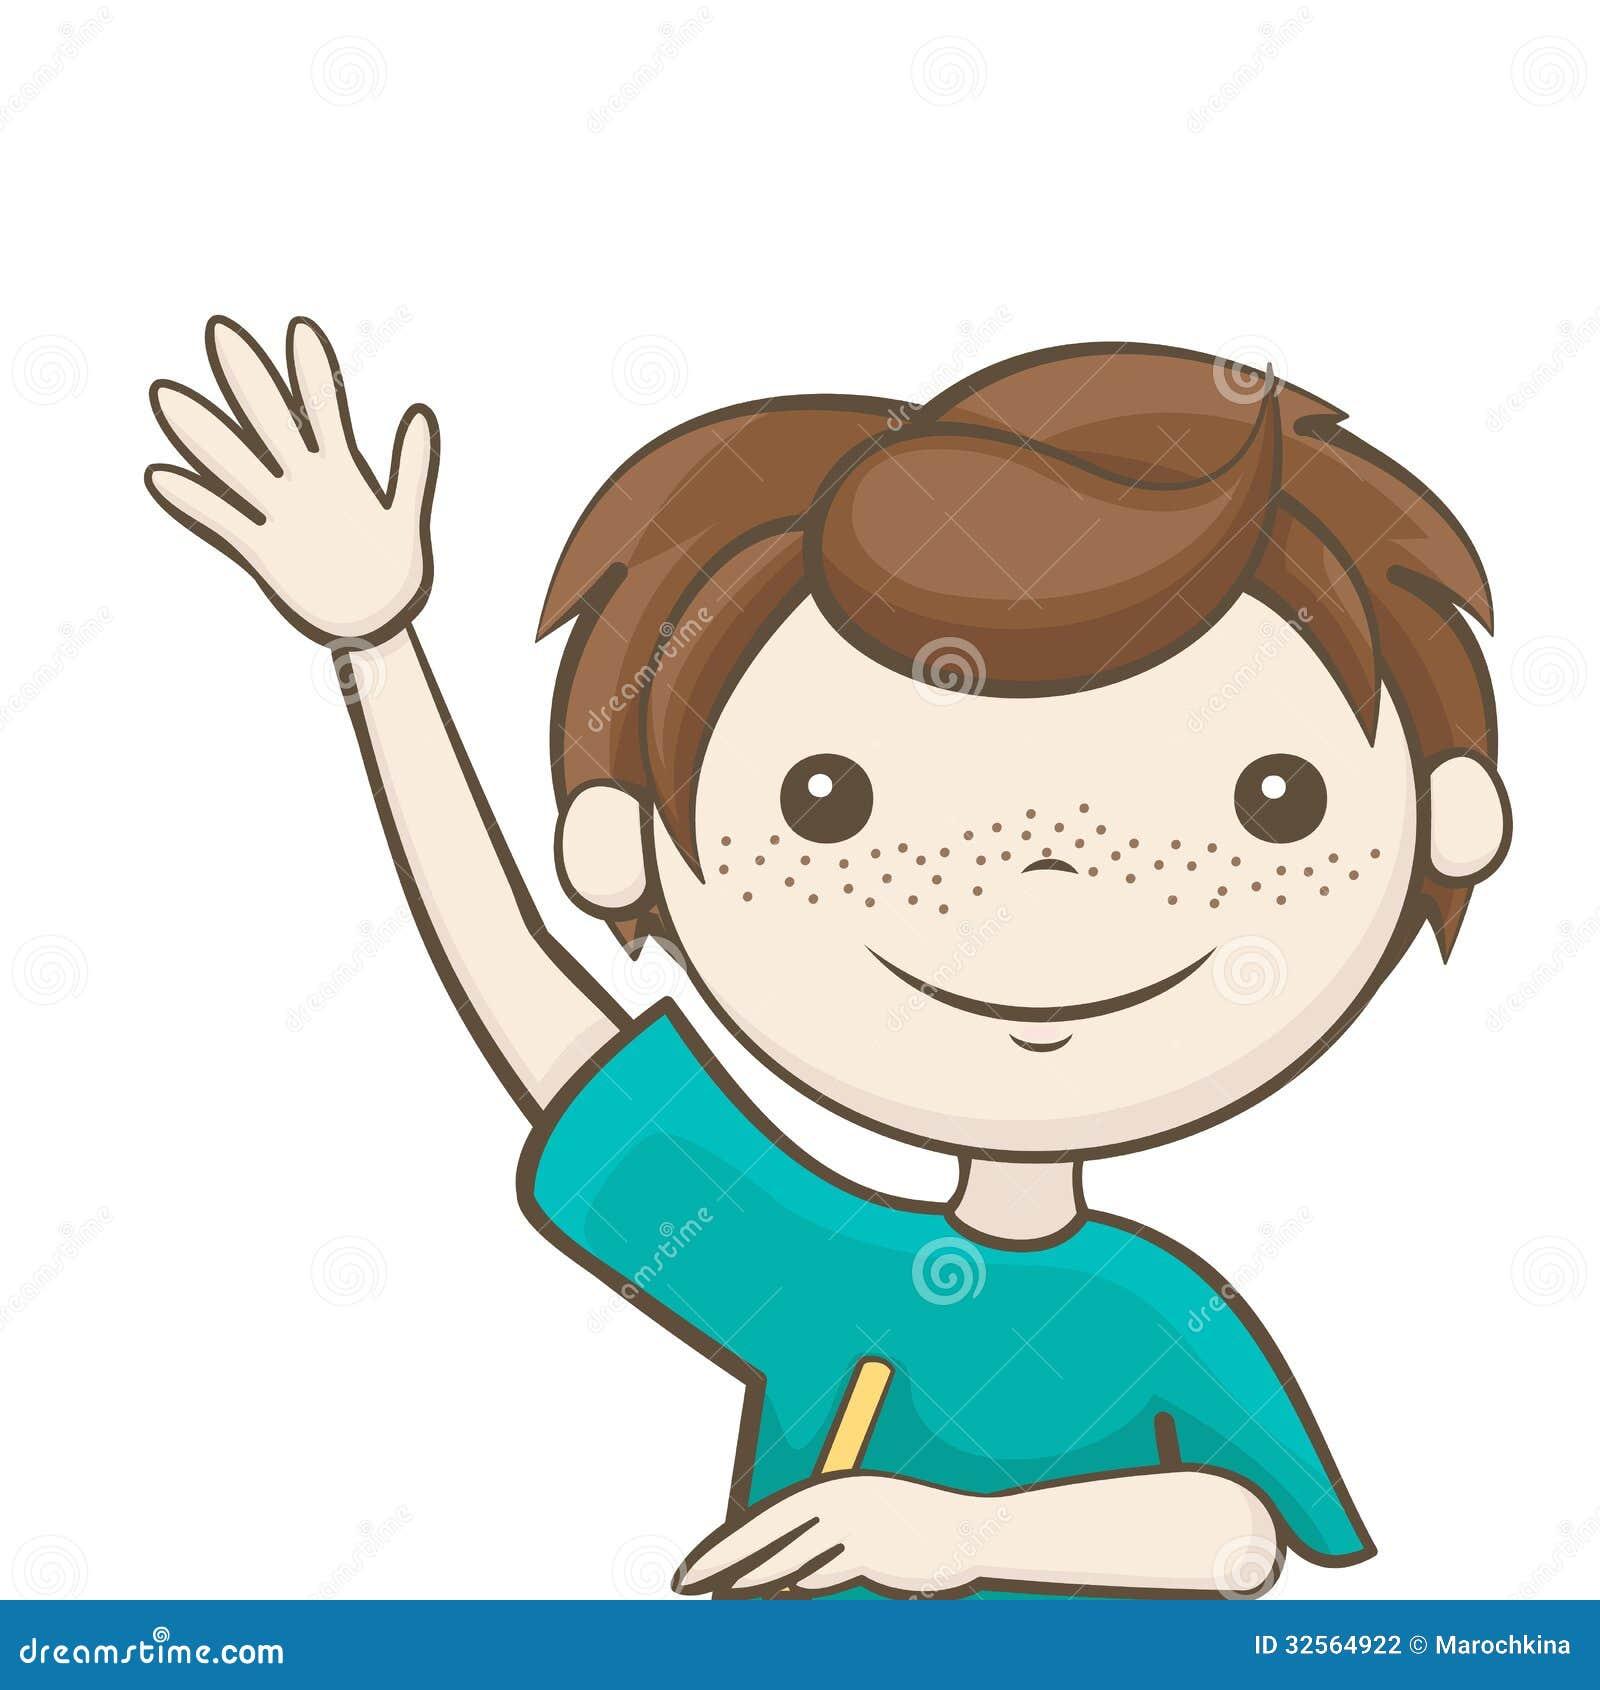 правило поднятой руки картинки